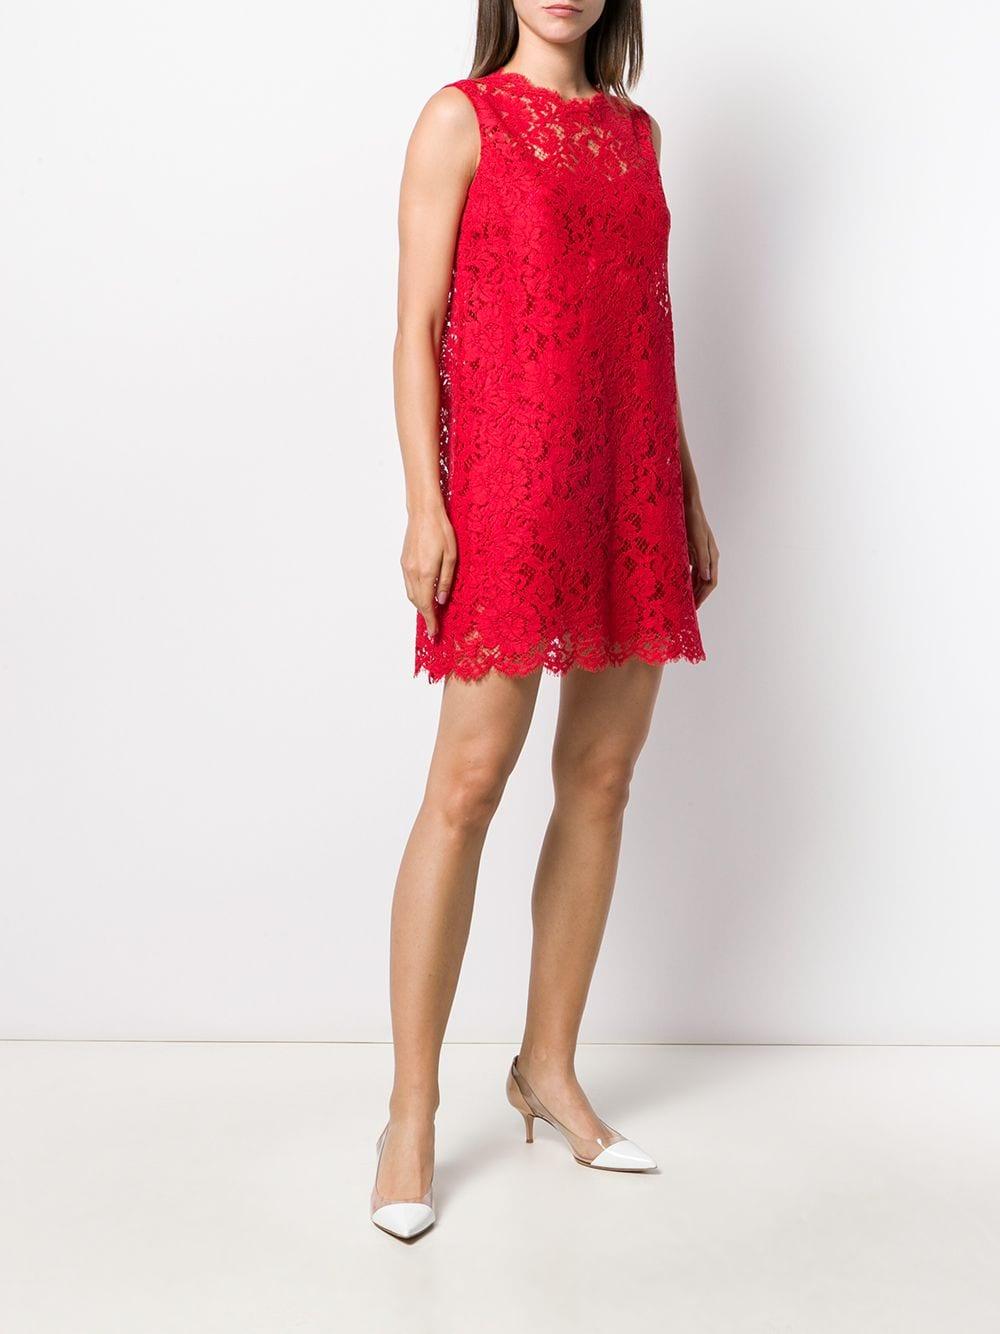 red silk and lance short sleveless dress DOLCE & GABBANA |  | F6A6OT-FLM9VR2254